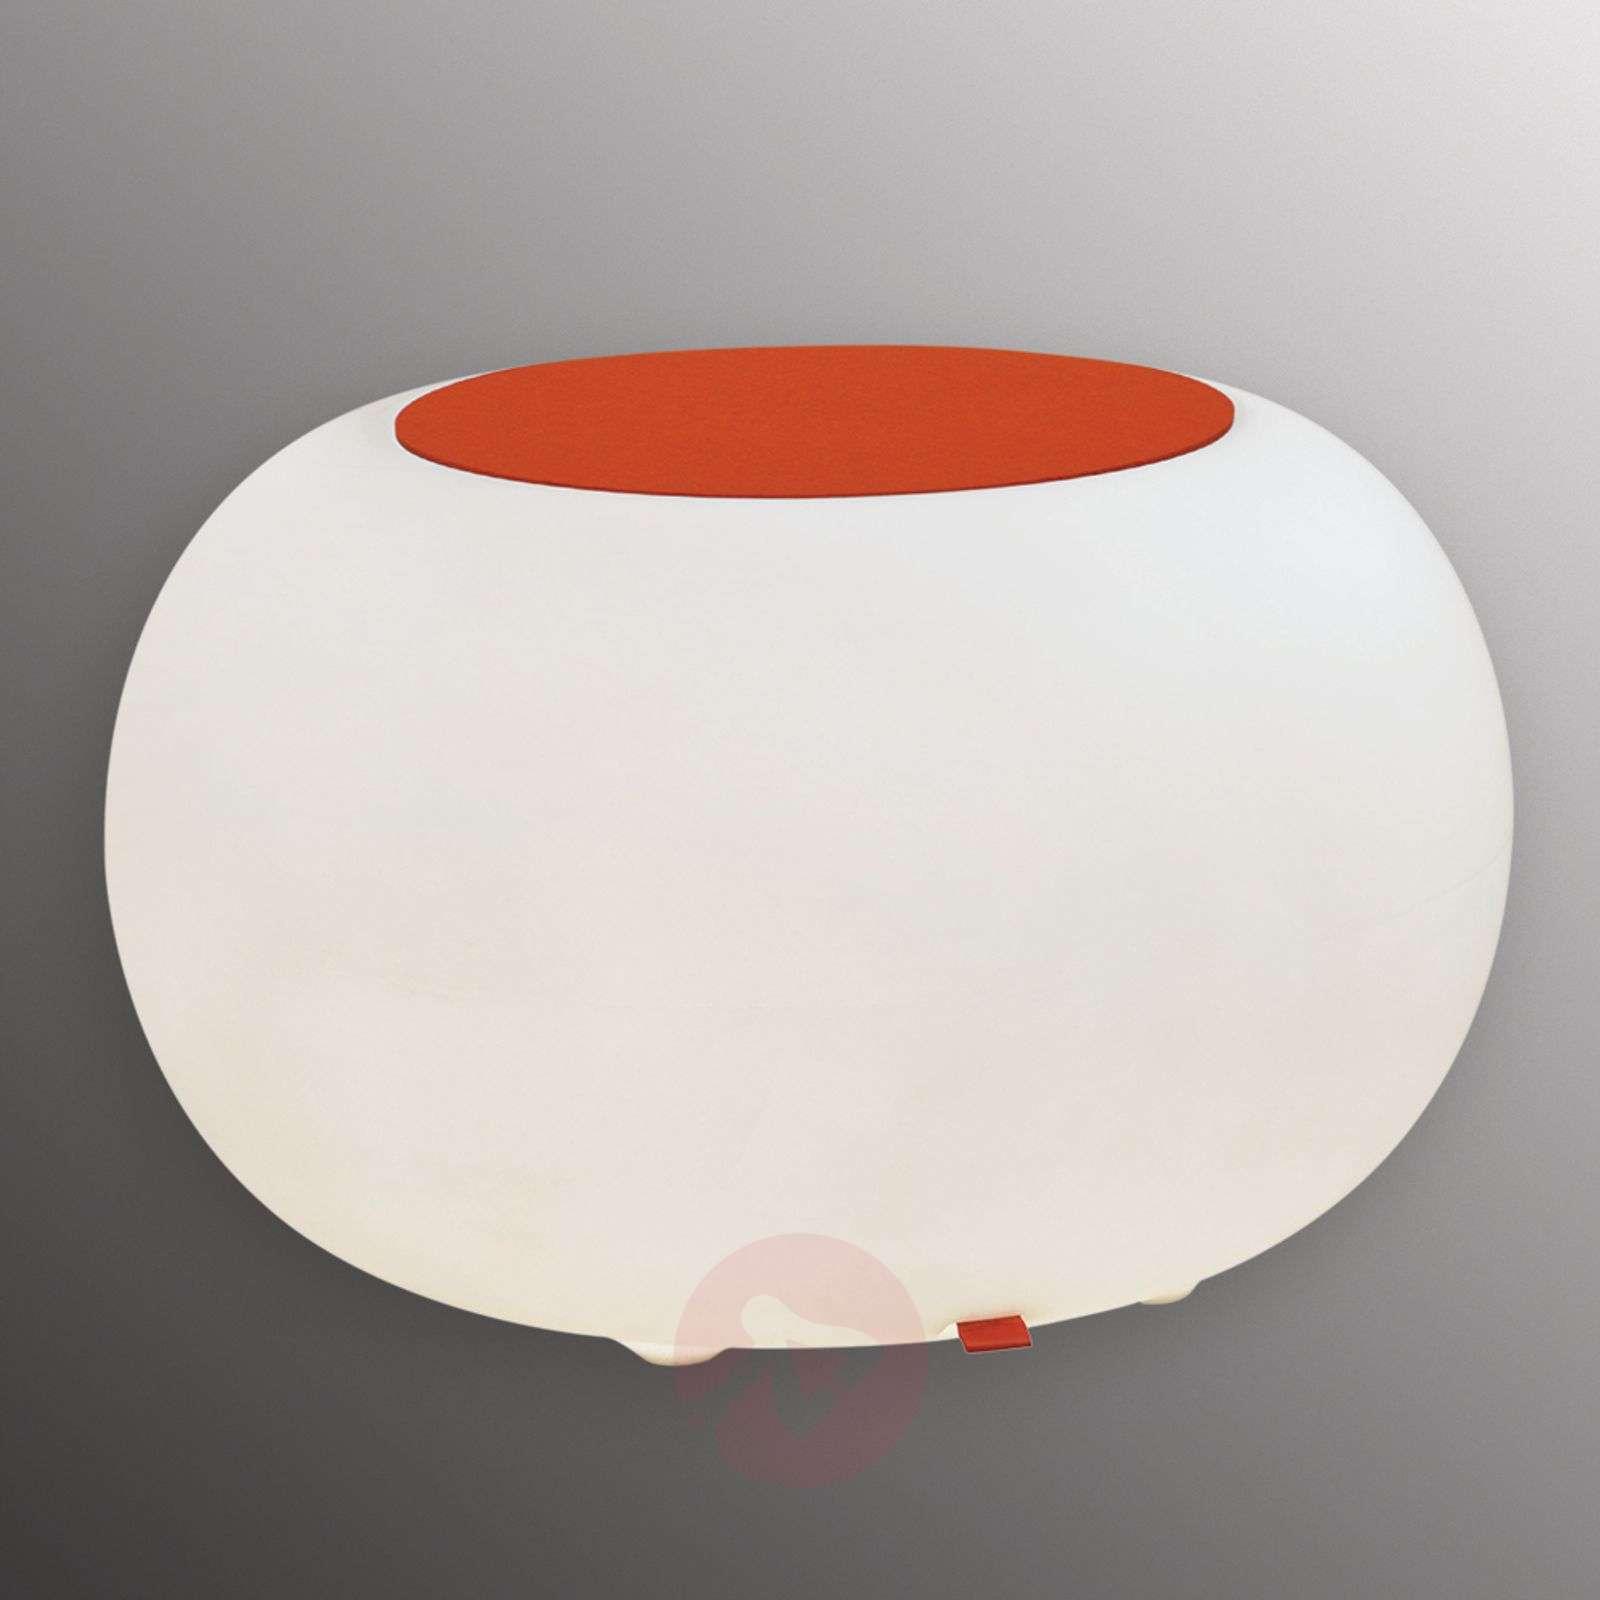 Pöytä Bubble Indoor LED RGB + huopa oranssi-6537058-01